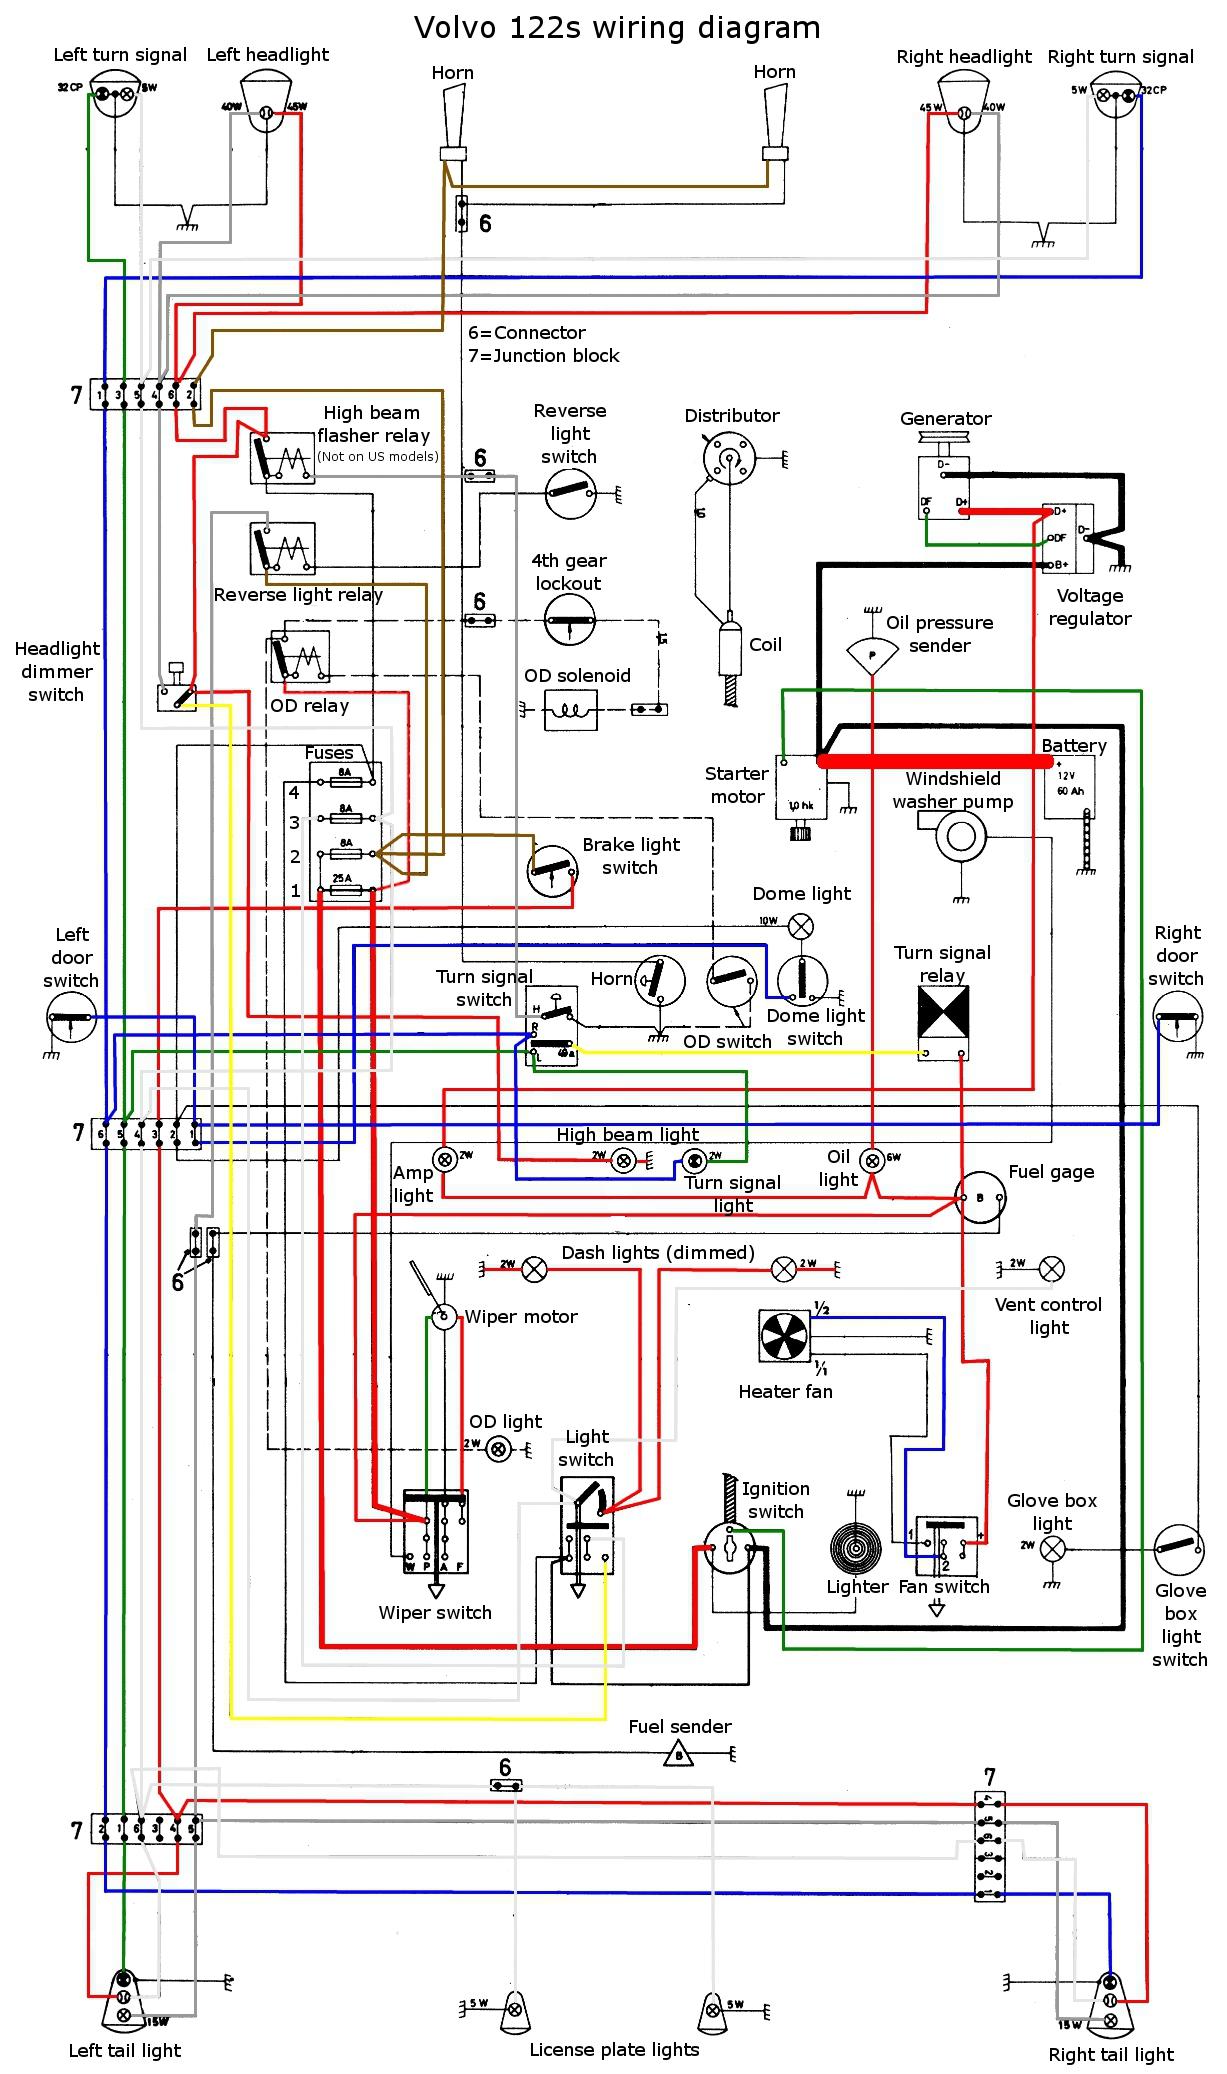 2008 s40 starter wiring diagram